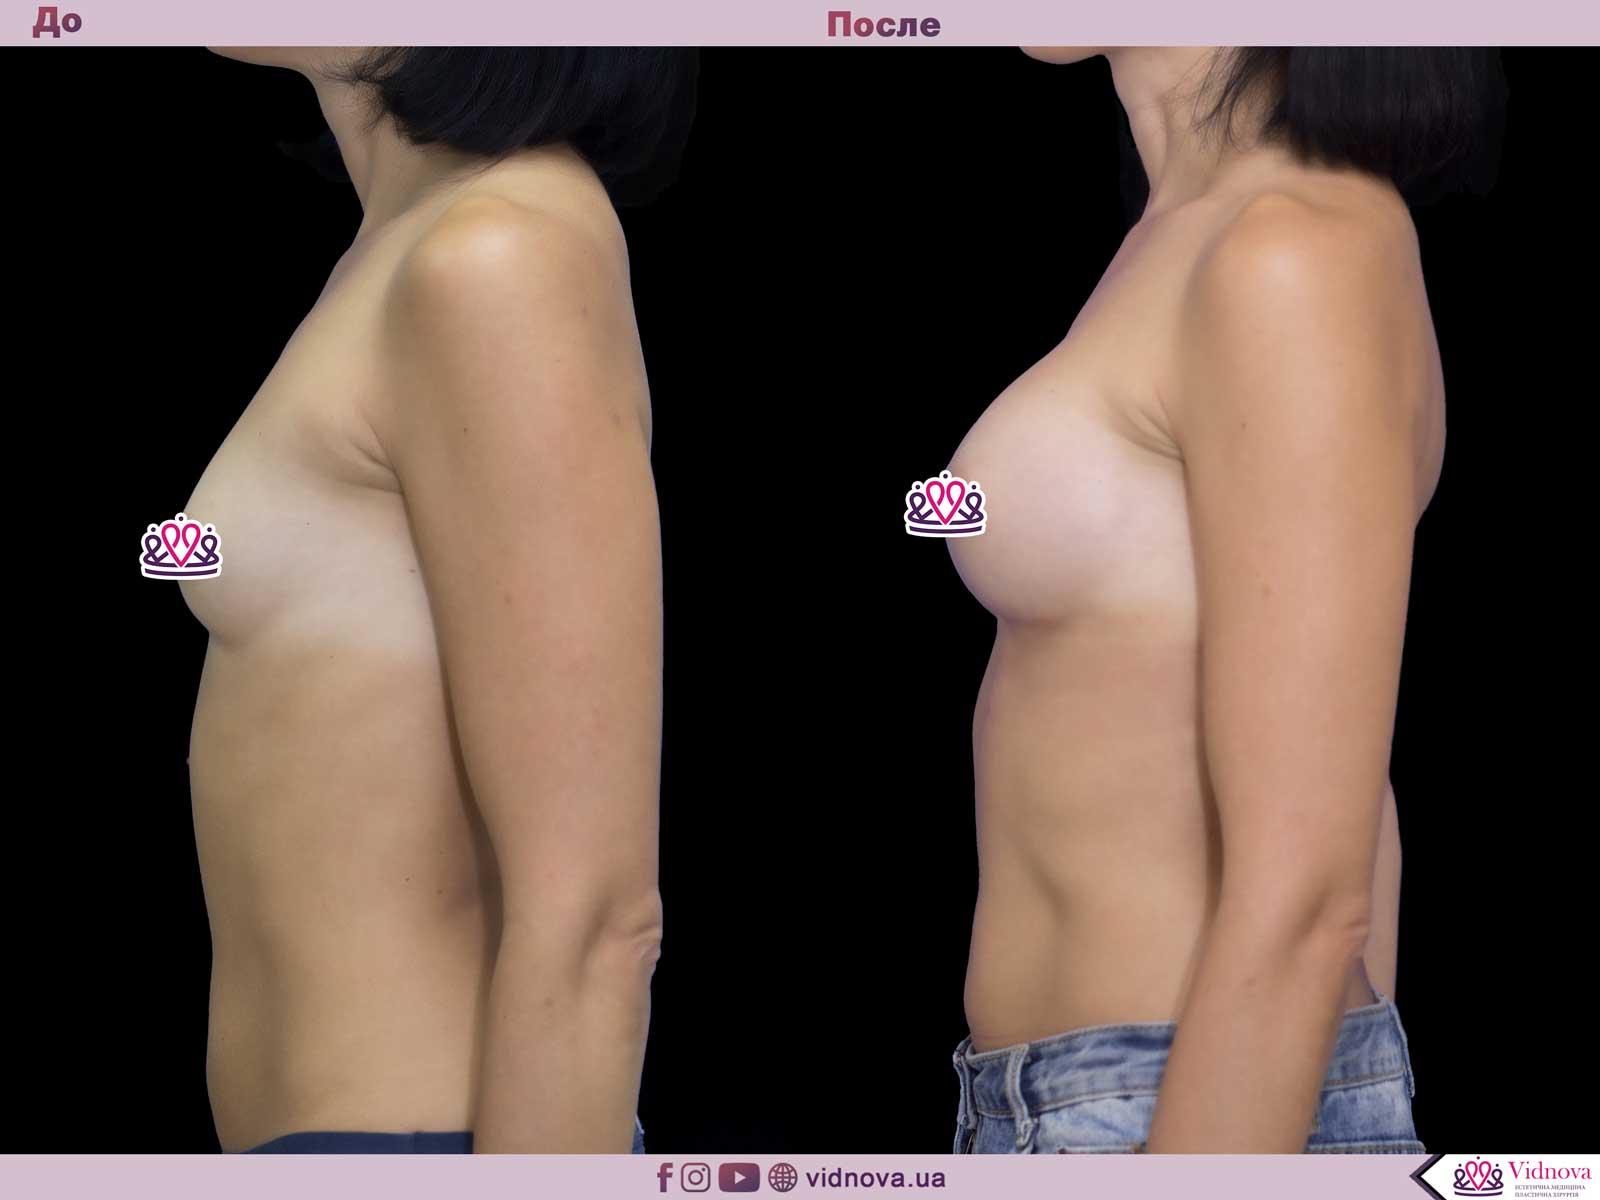 Увеличение груди: Фото ДО и ПОСЛЕ - Пример №48-3 - Клиника Vidnova